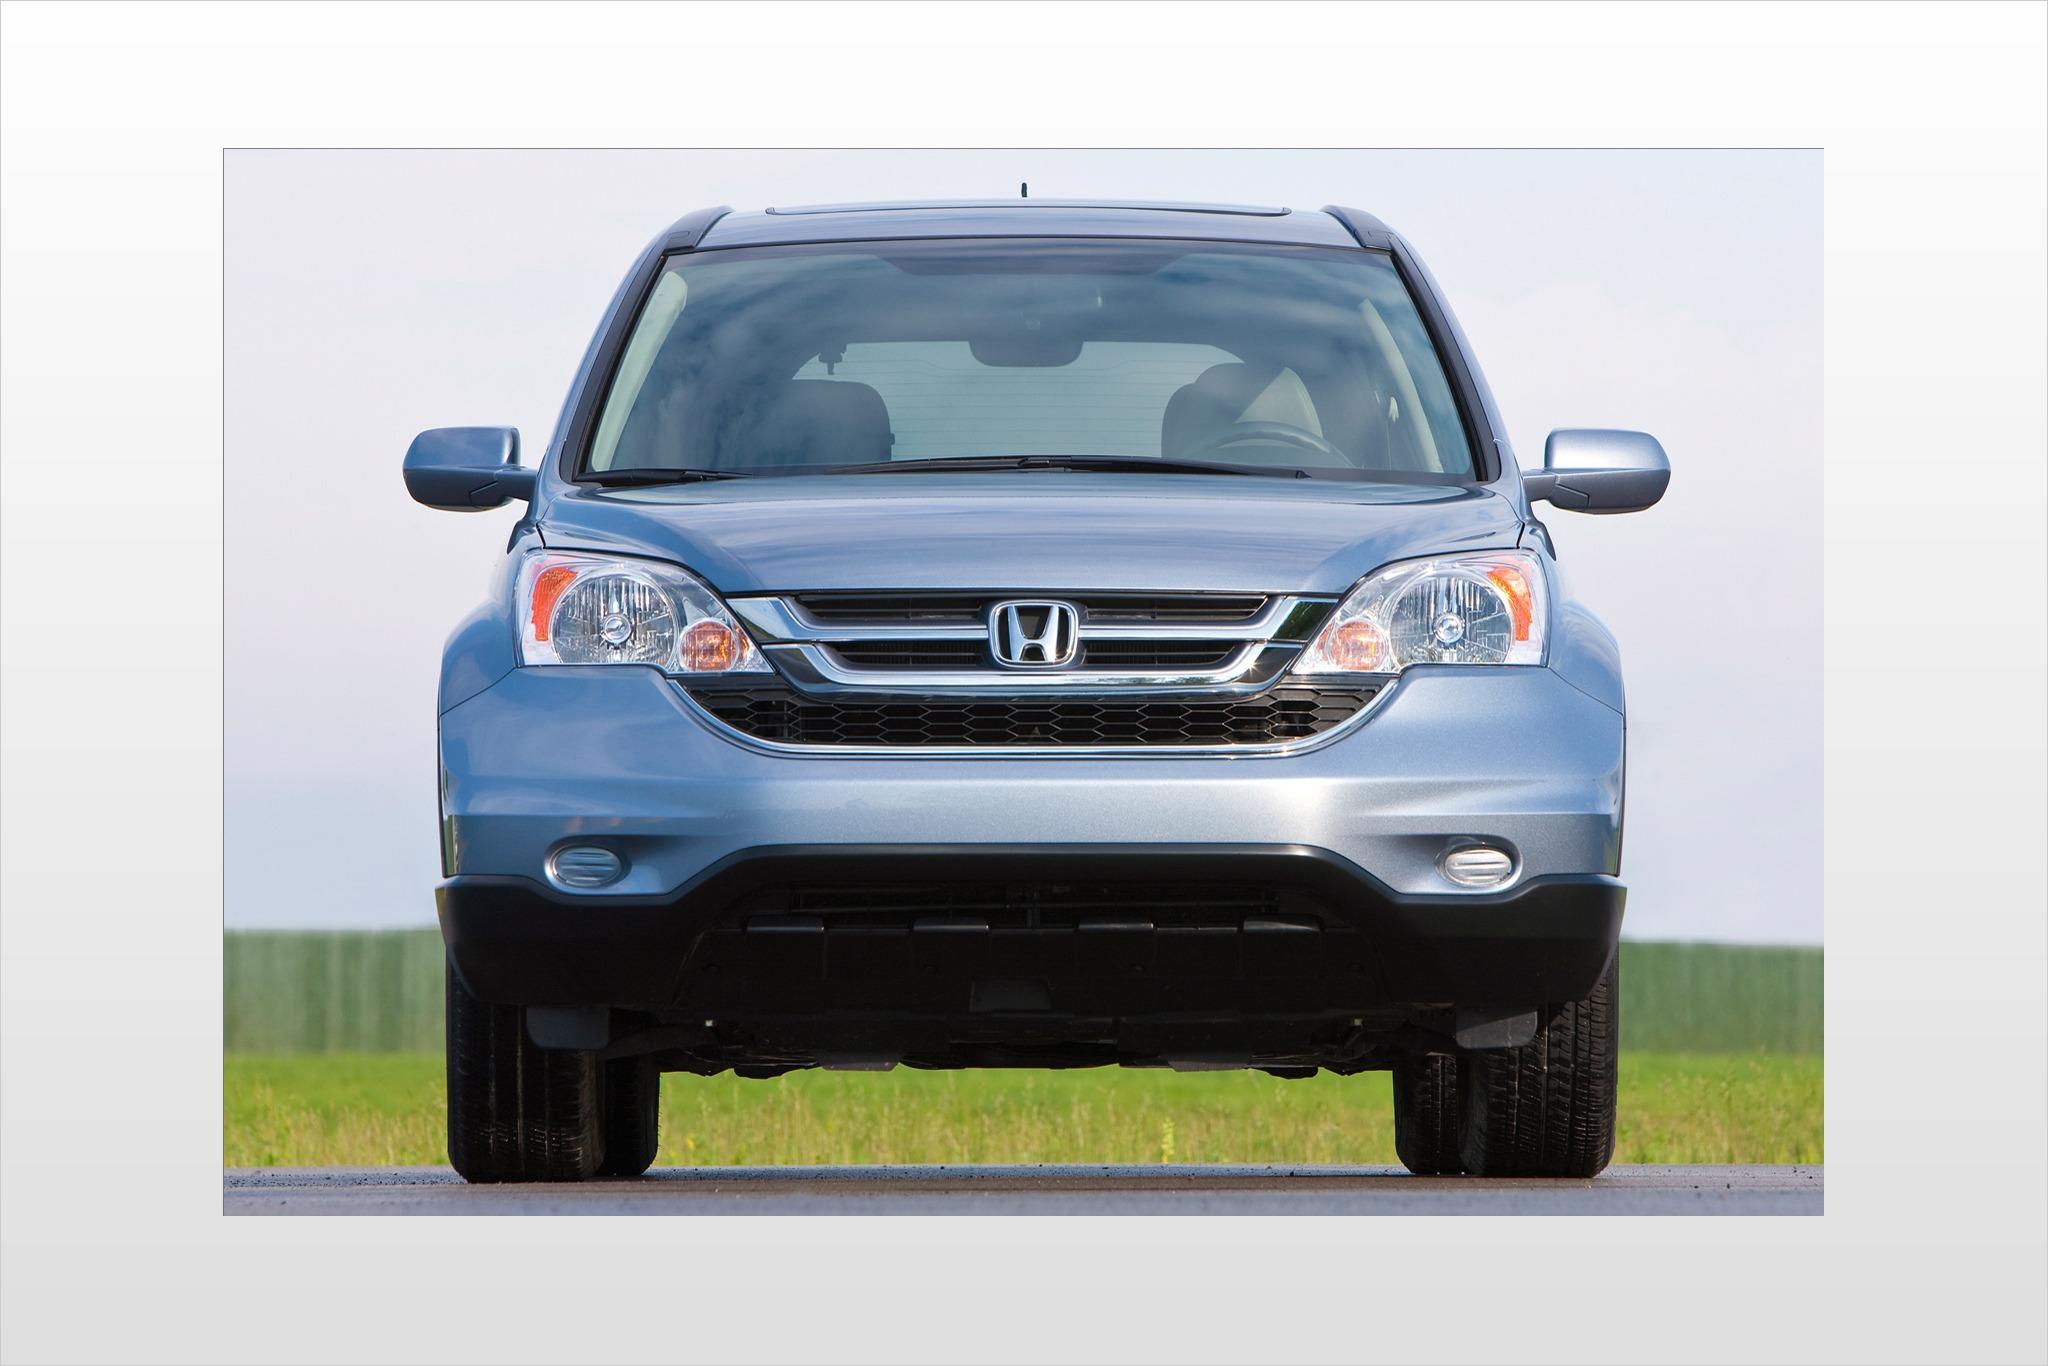 2011 Honda Cr V Image 6